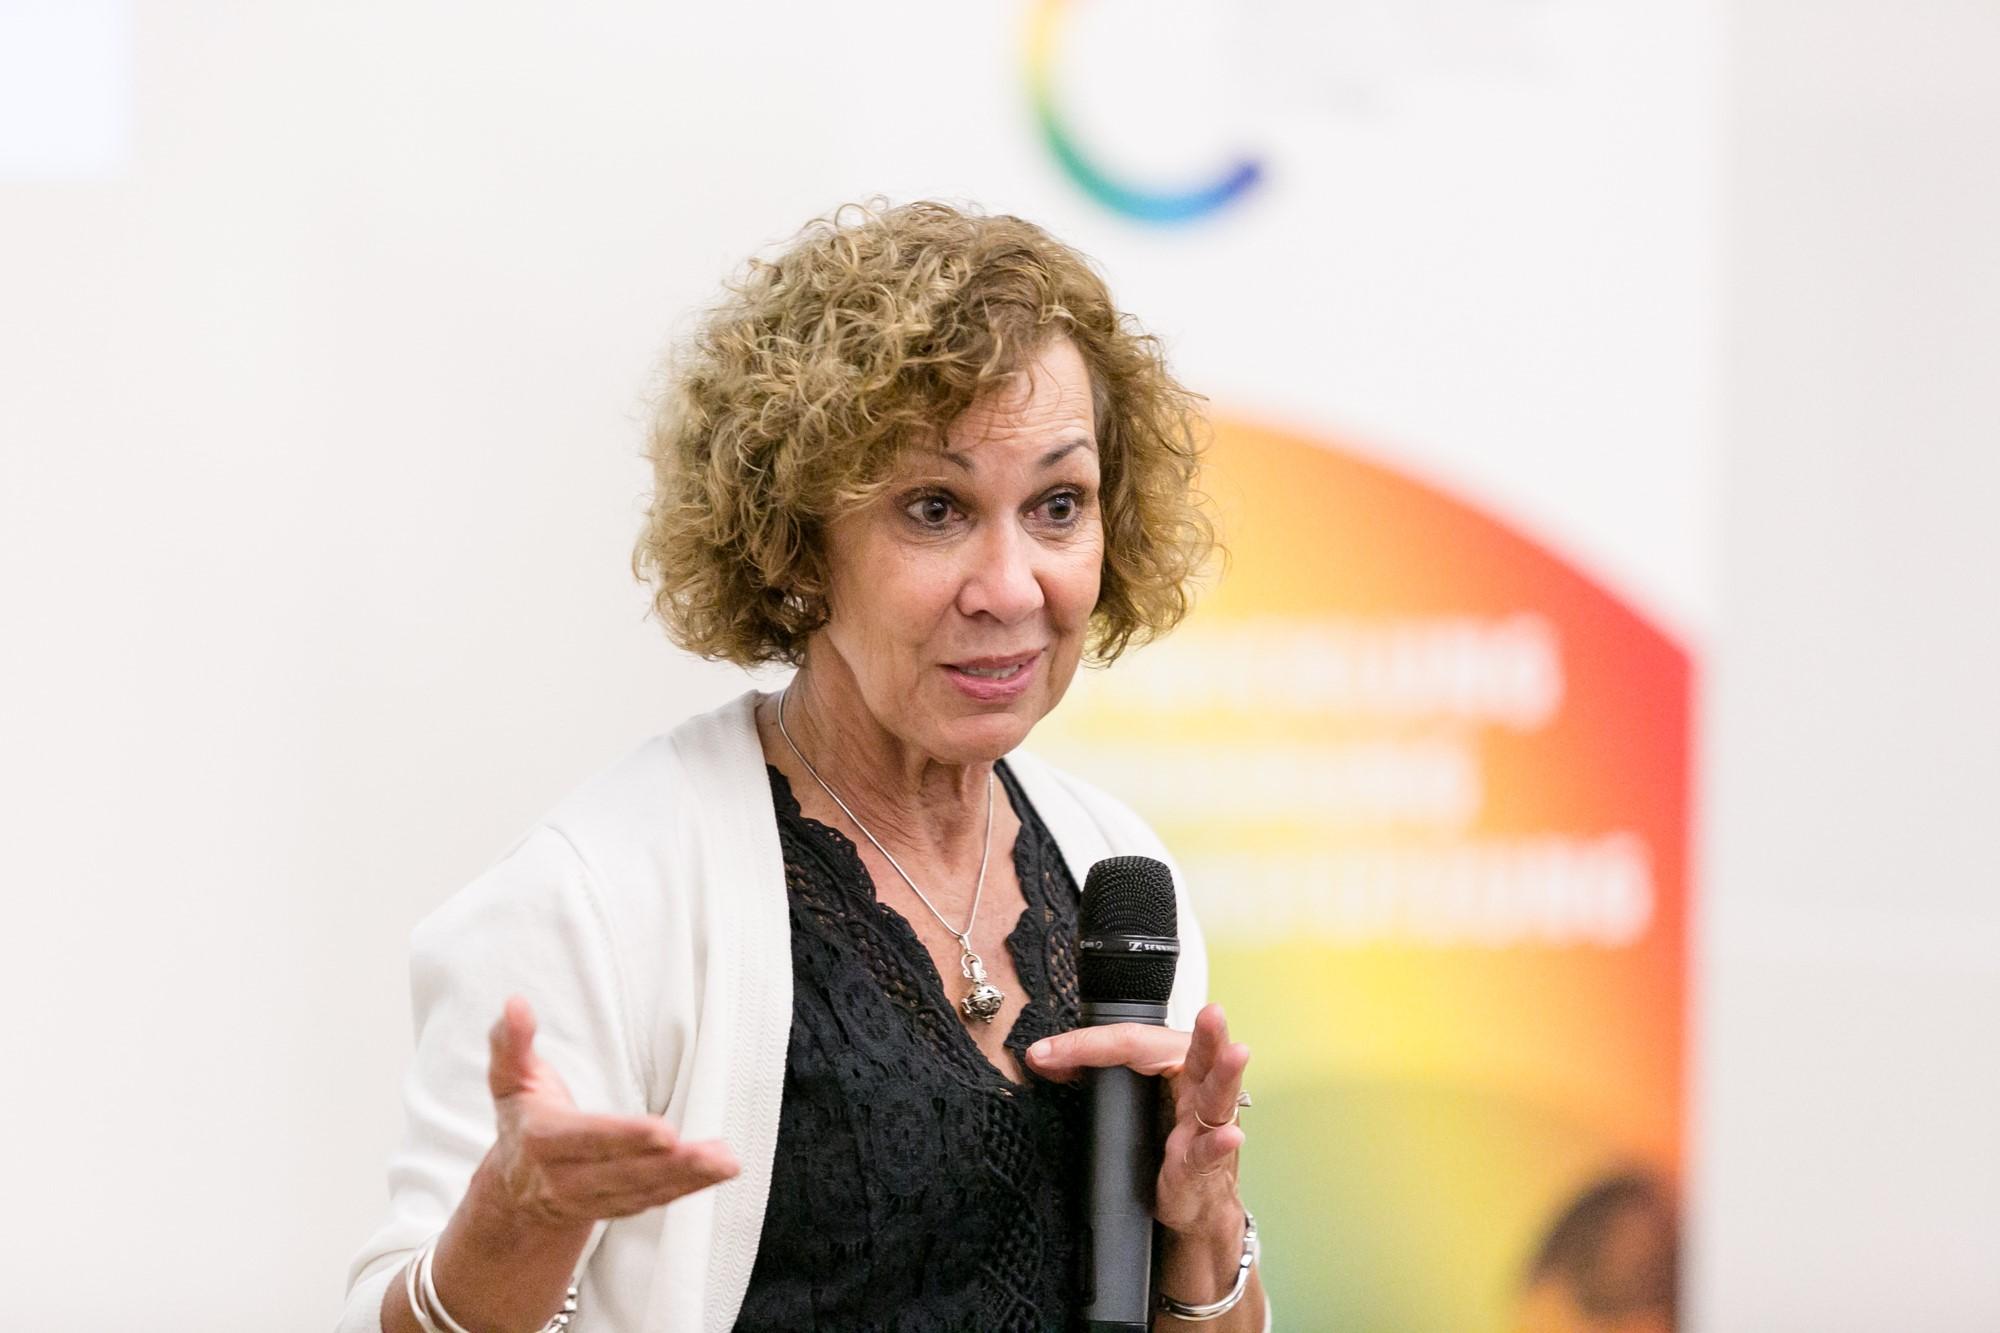 Dr. Pamela Jeffries